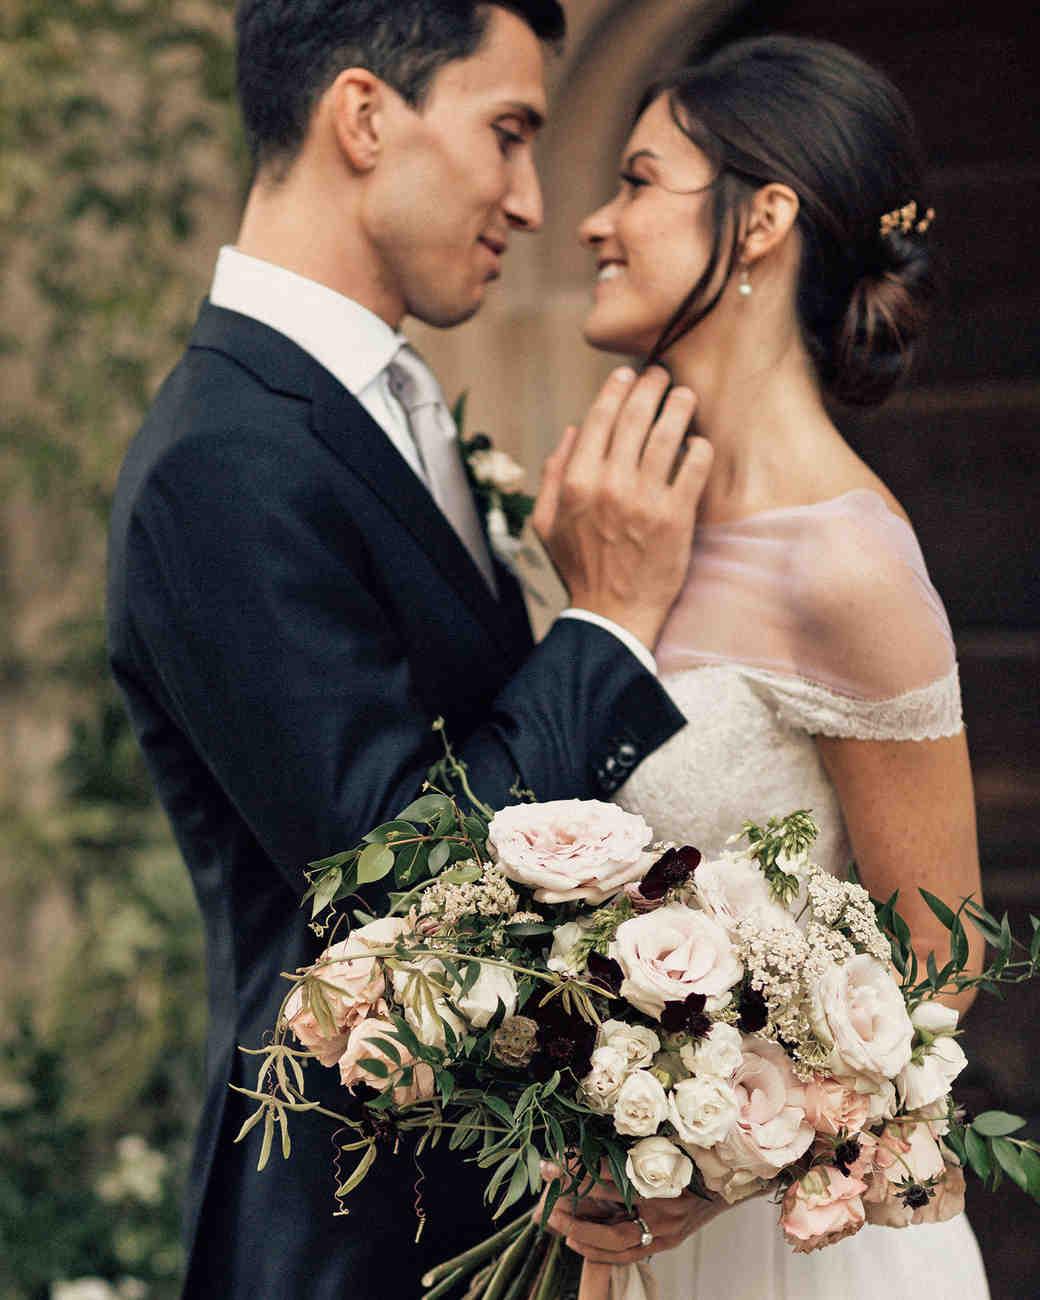 natalie paul bride and groom wedding bouquet